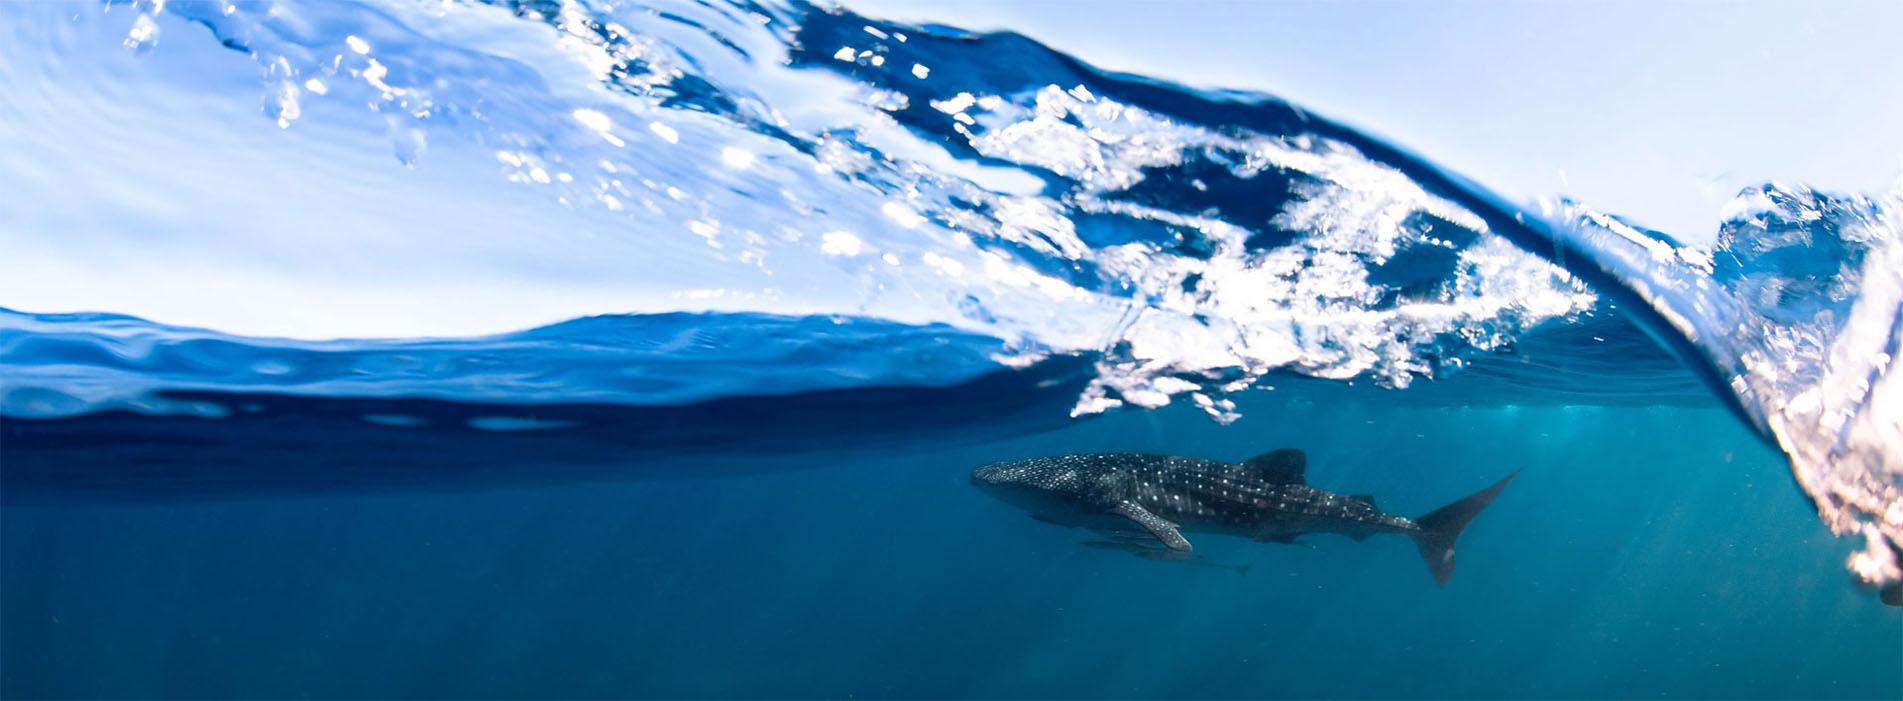 WHALE-SHARK-SWIM-DIVE BOOKINGS TOURS-2021